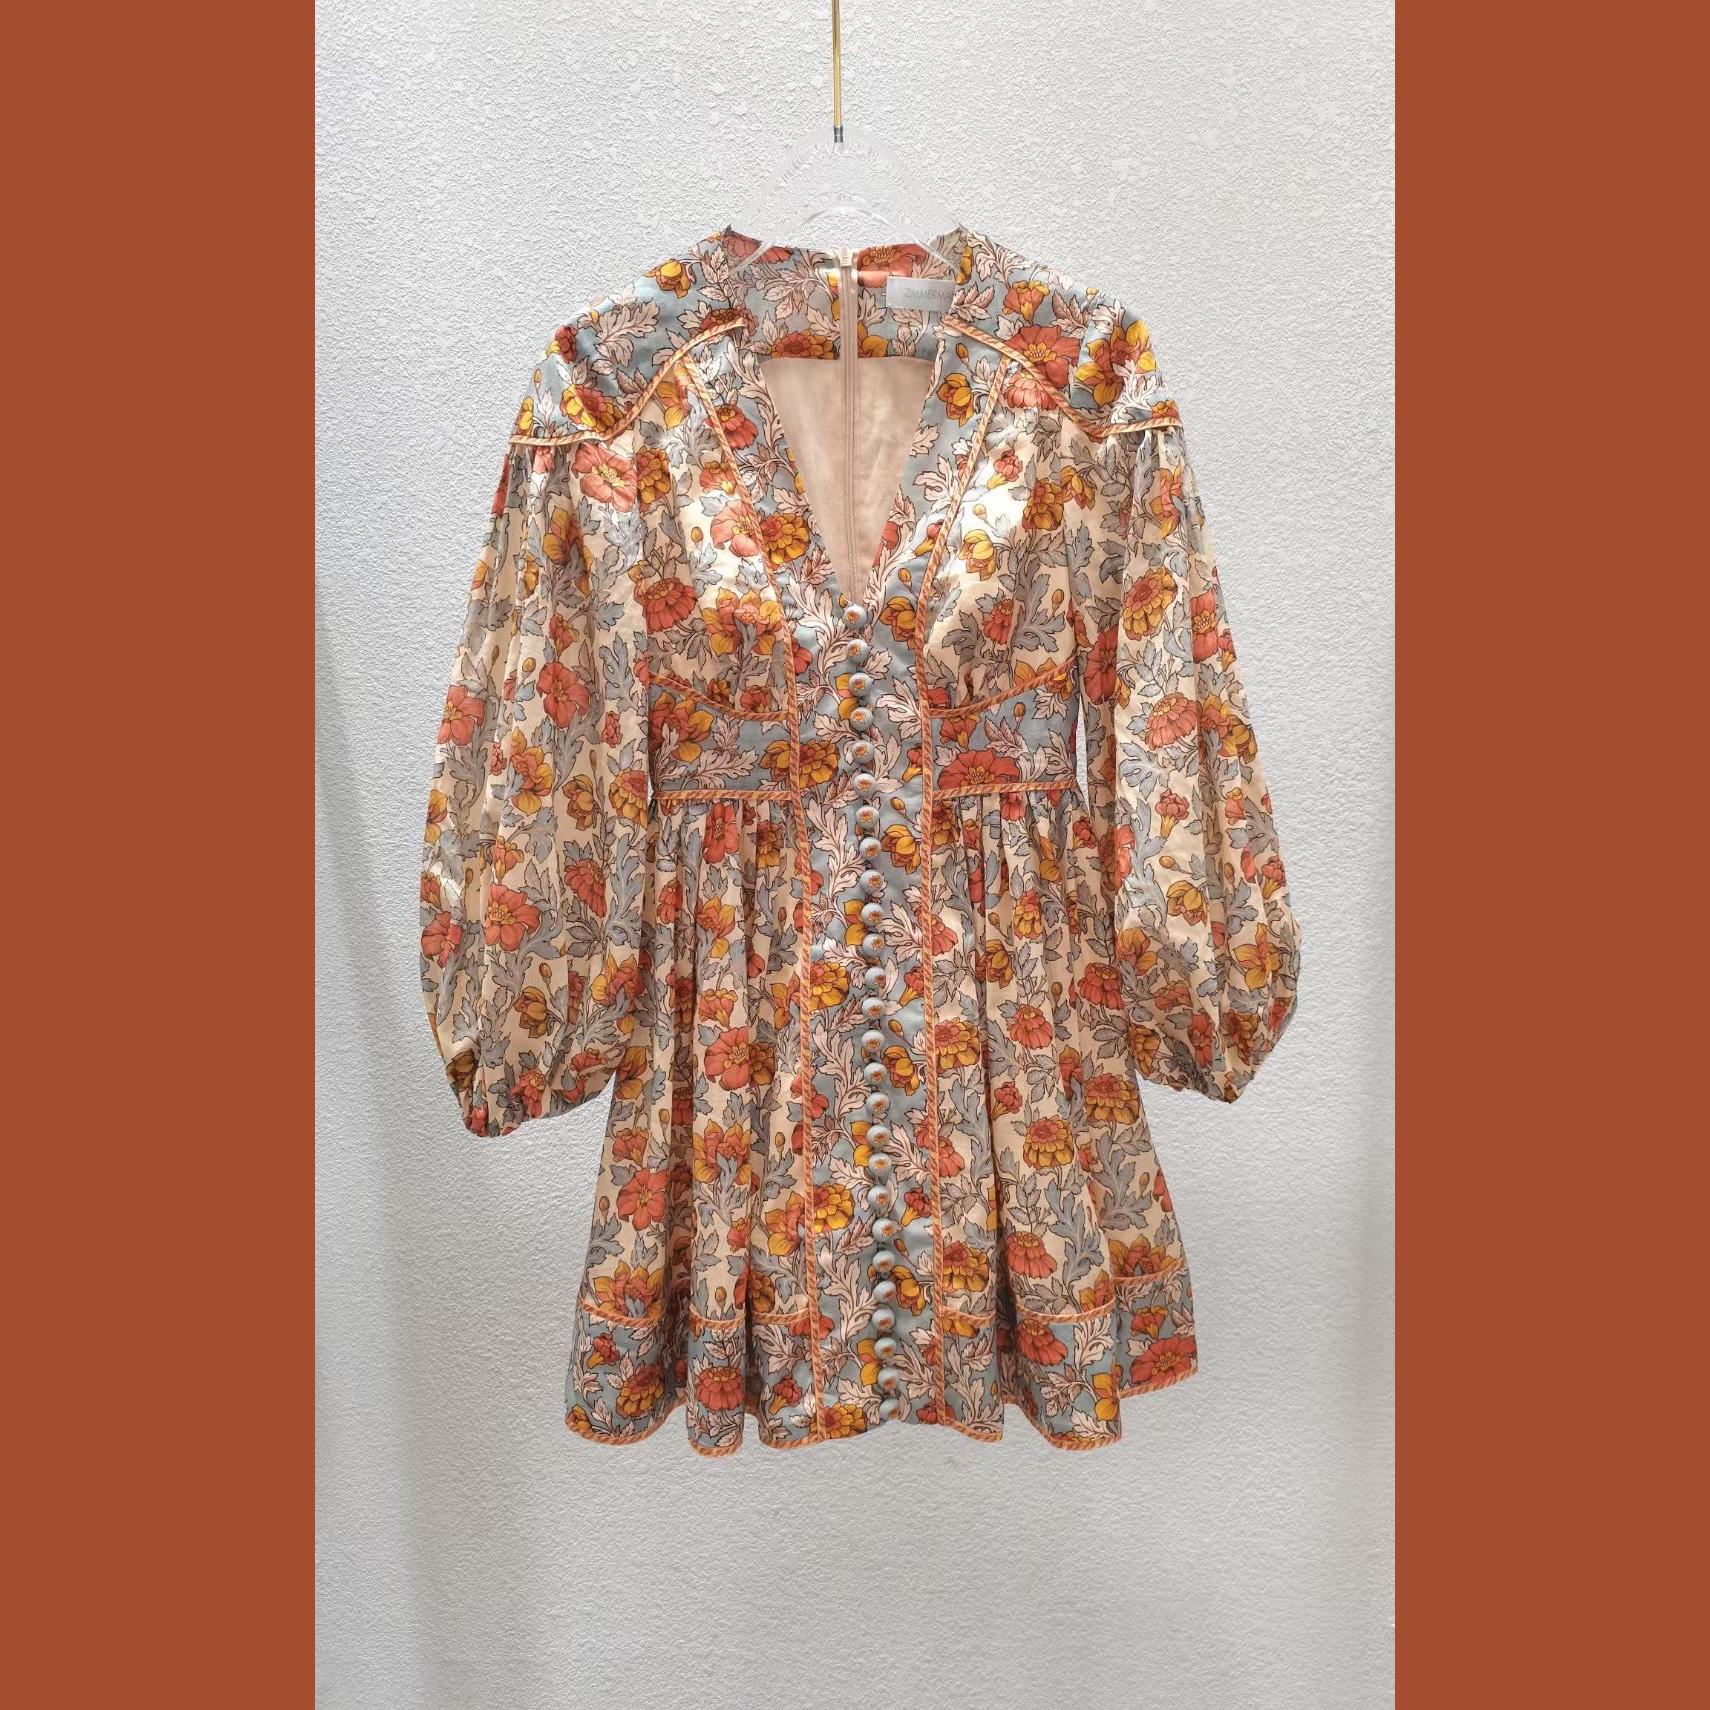 Z*M澳洲 春季新款22纽扣迷你棉质连衣裙短款裙子修身显瘦花卉印花